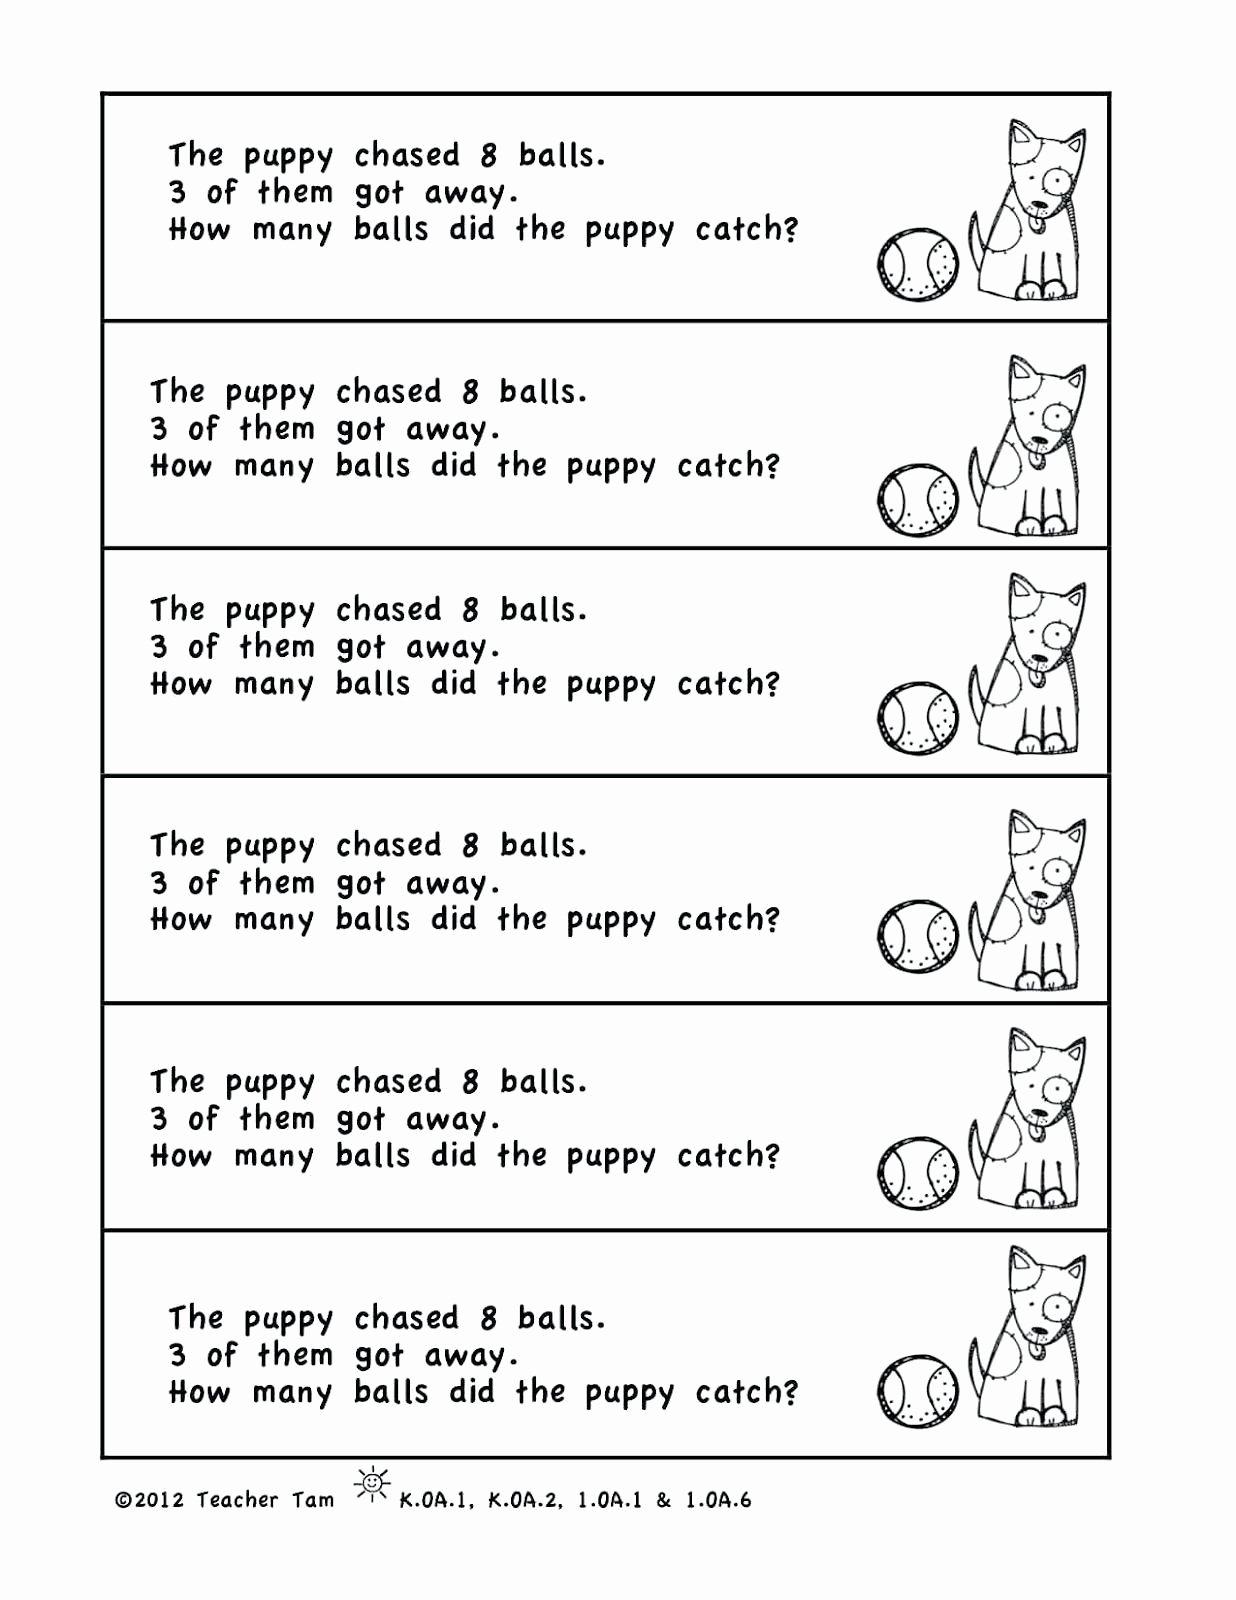 Problem solving Worksheets for Preschoolers Best Of 5 Free Math Worksheets Second Grade 2 Word Problems 2nd